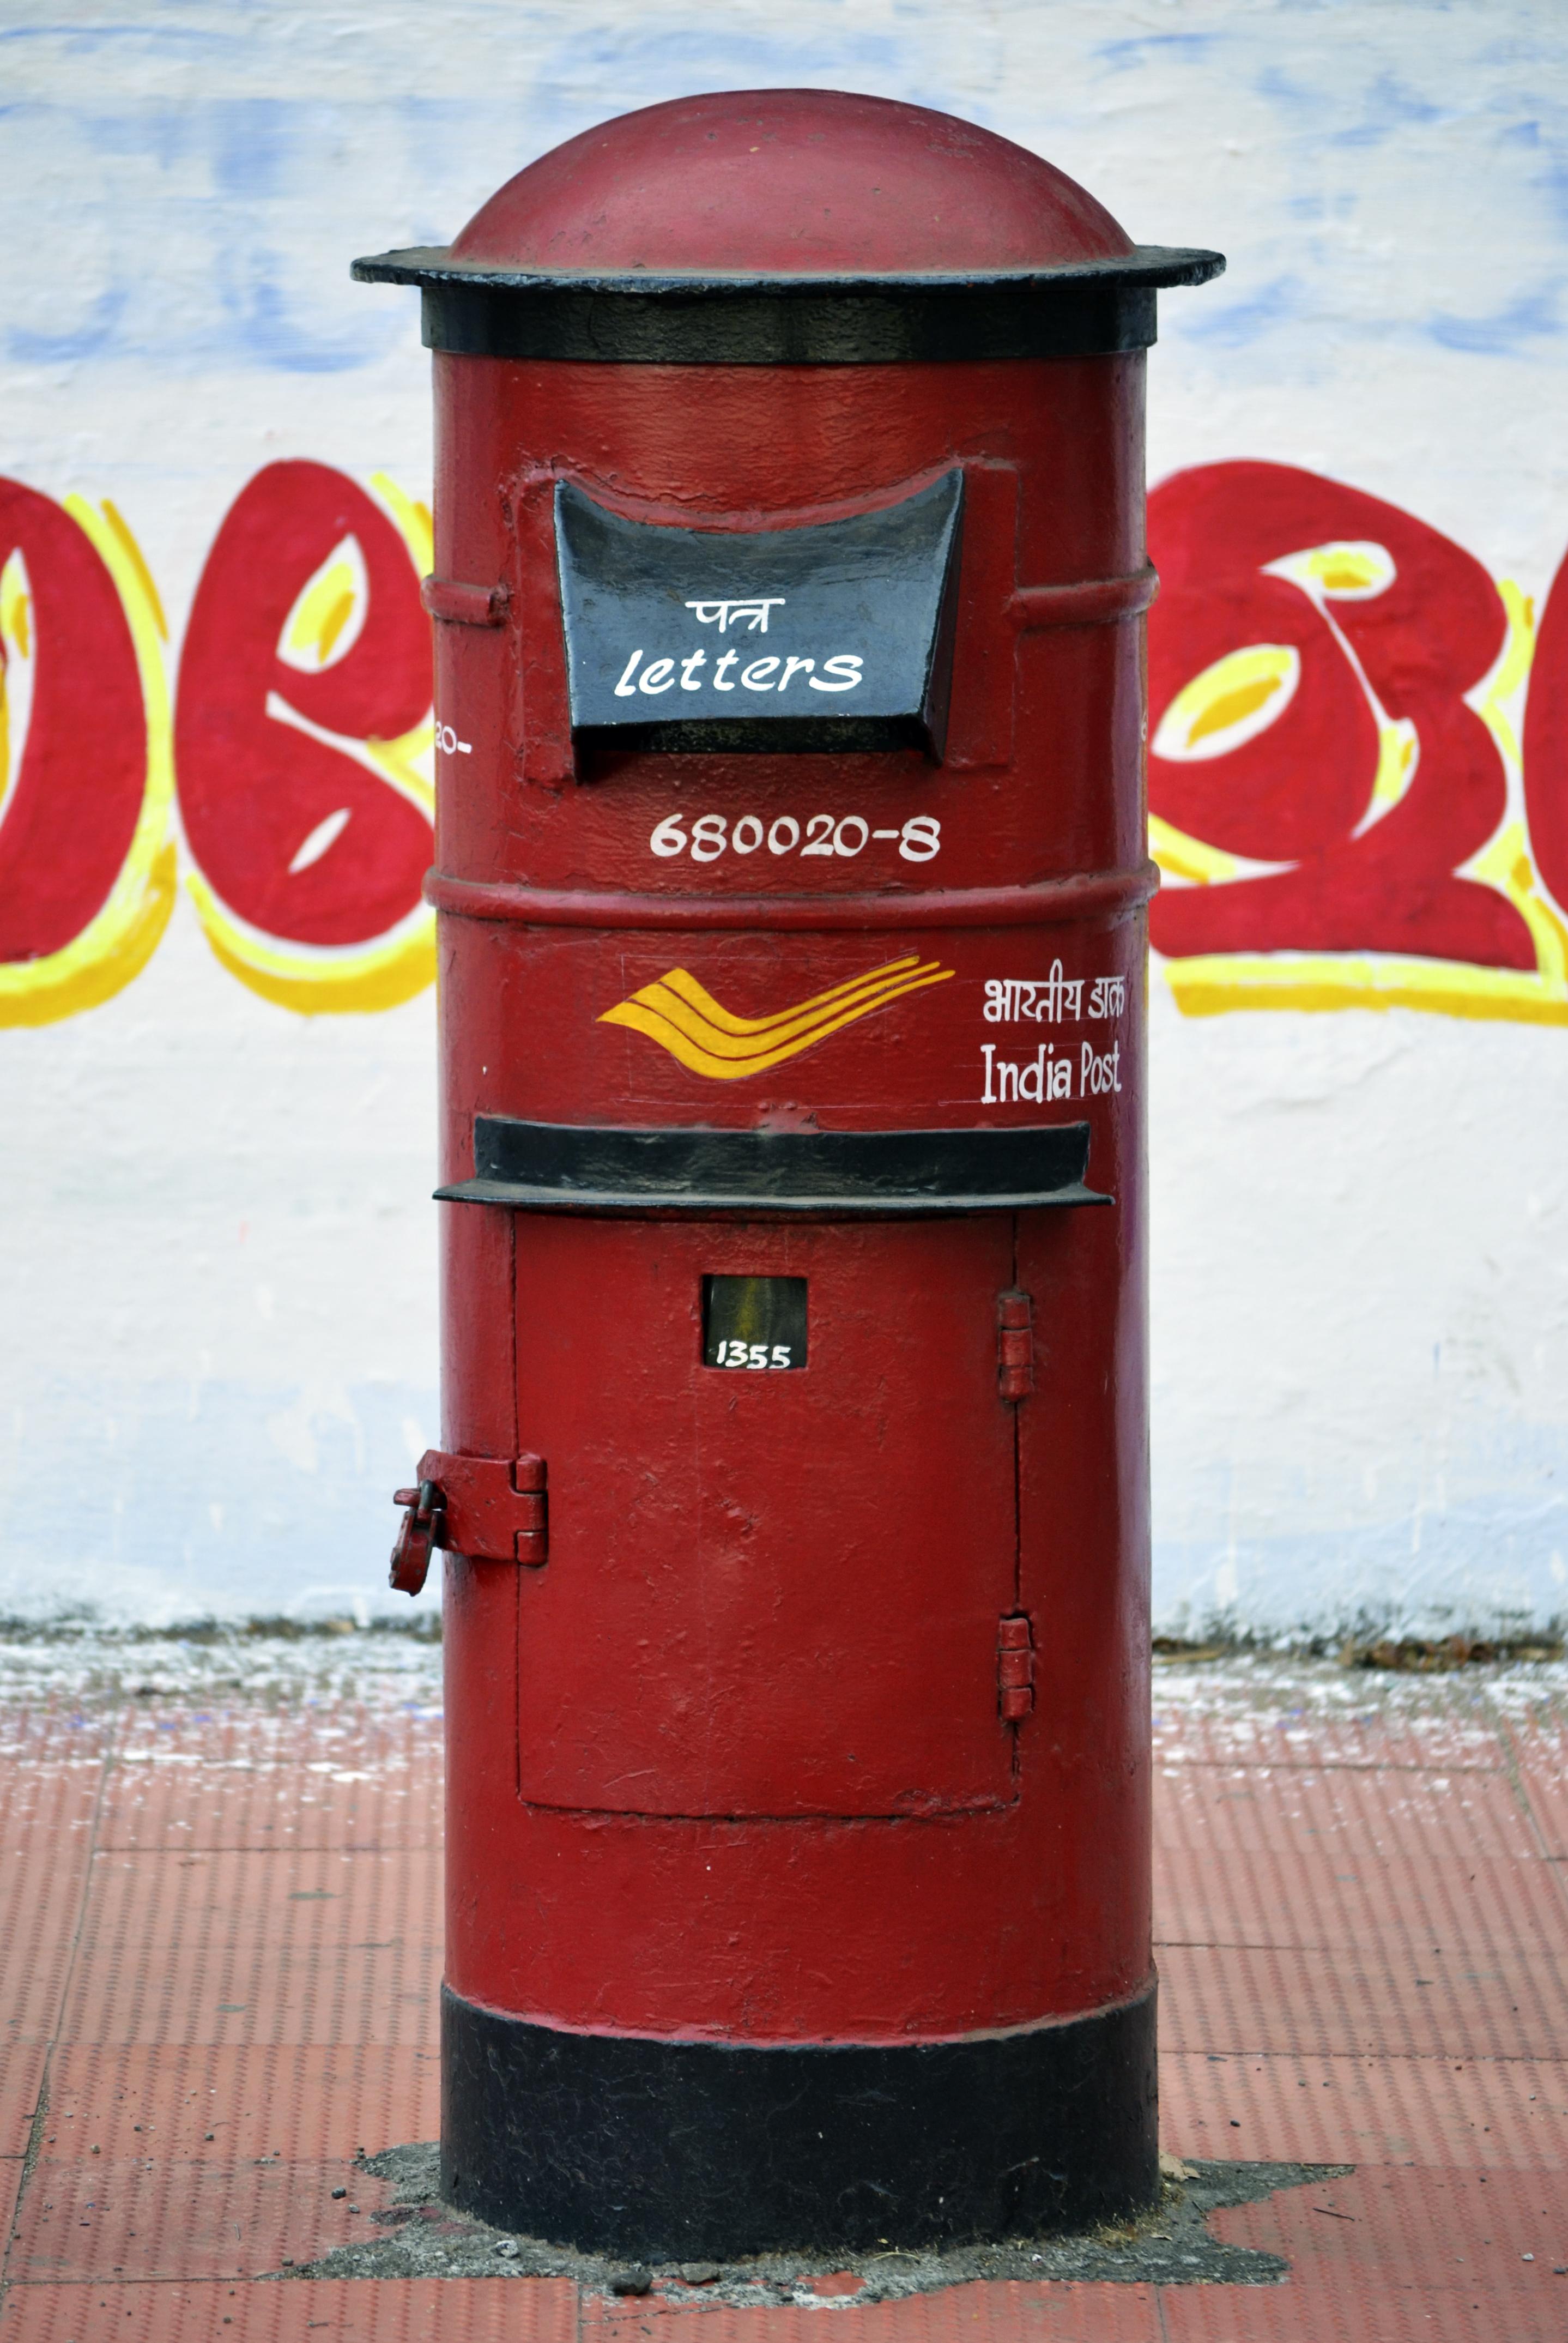 FilePost Box Of India